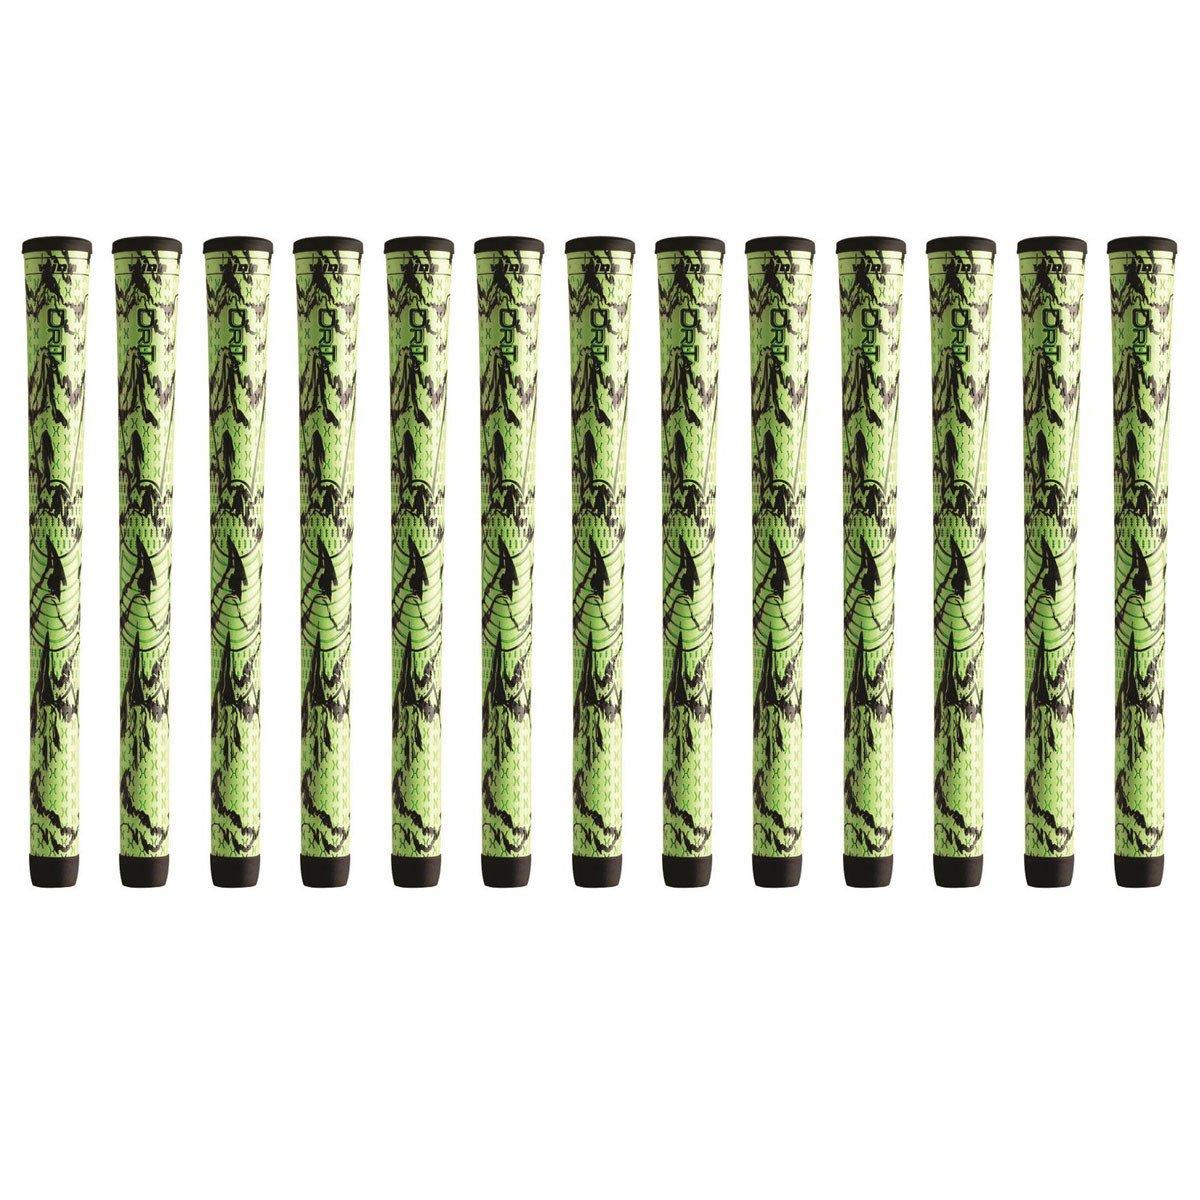 Winn DriTac X標準グリーン/ブラックゴルフグリップバンドル(13個) B0792D59Q7